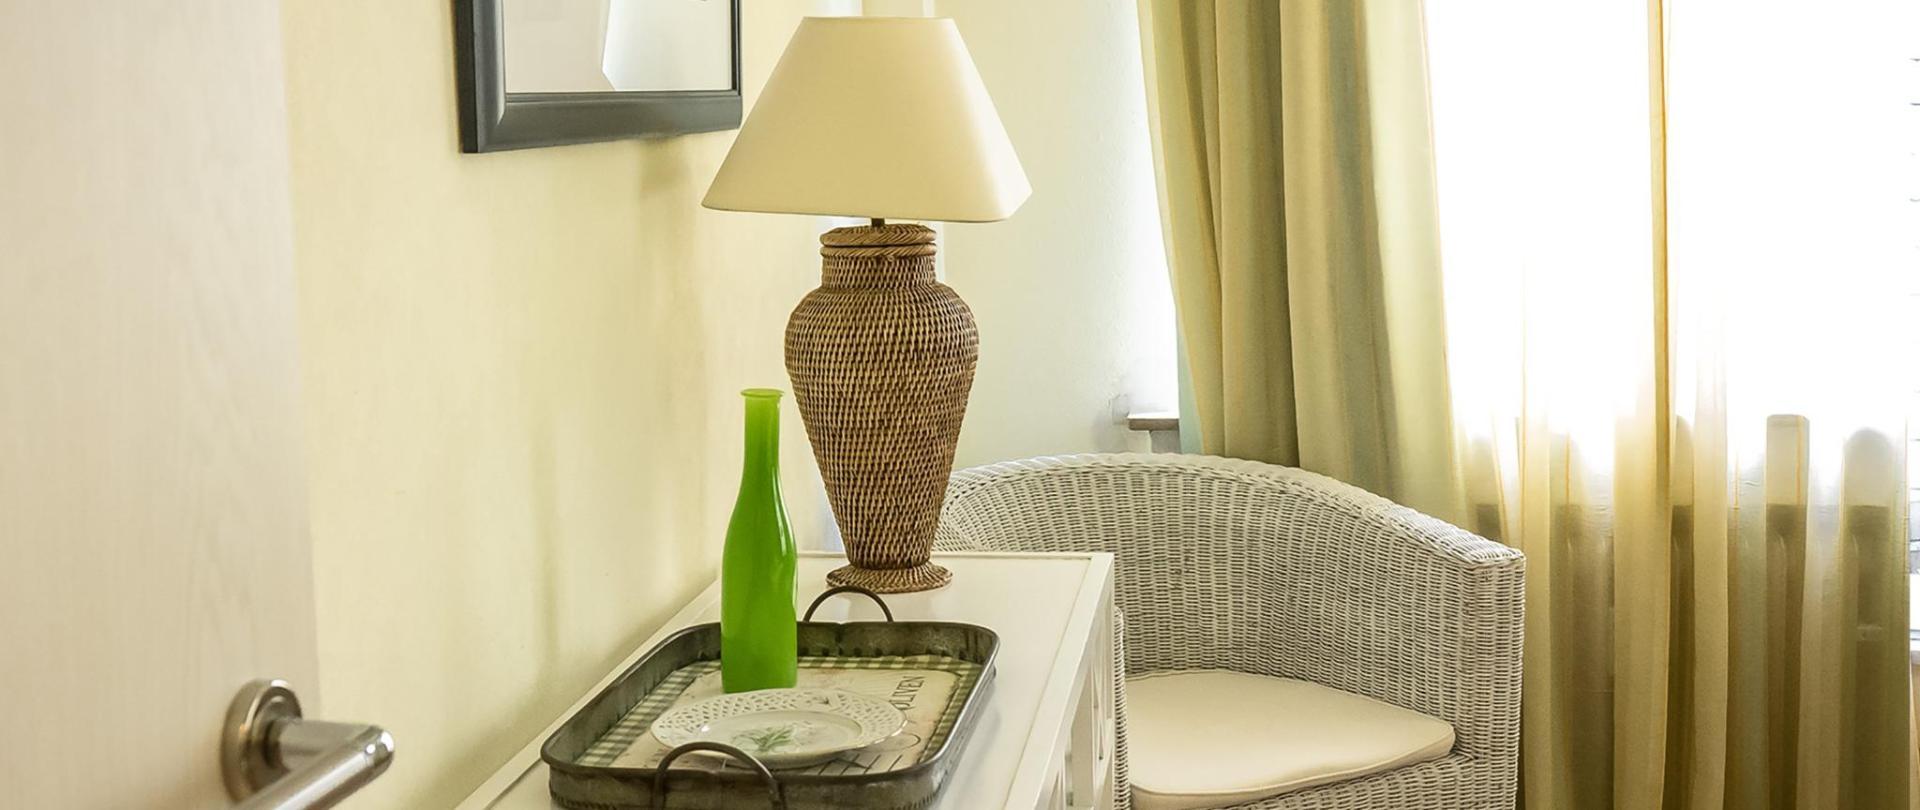 hotel-3koenige-aachen-zimmer_31-limburg_02.jpg